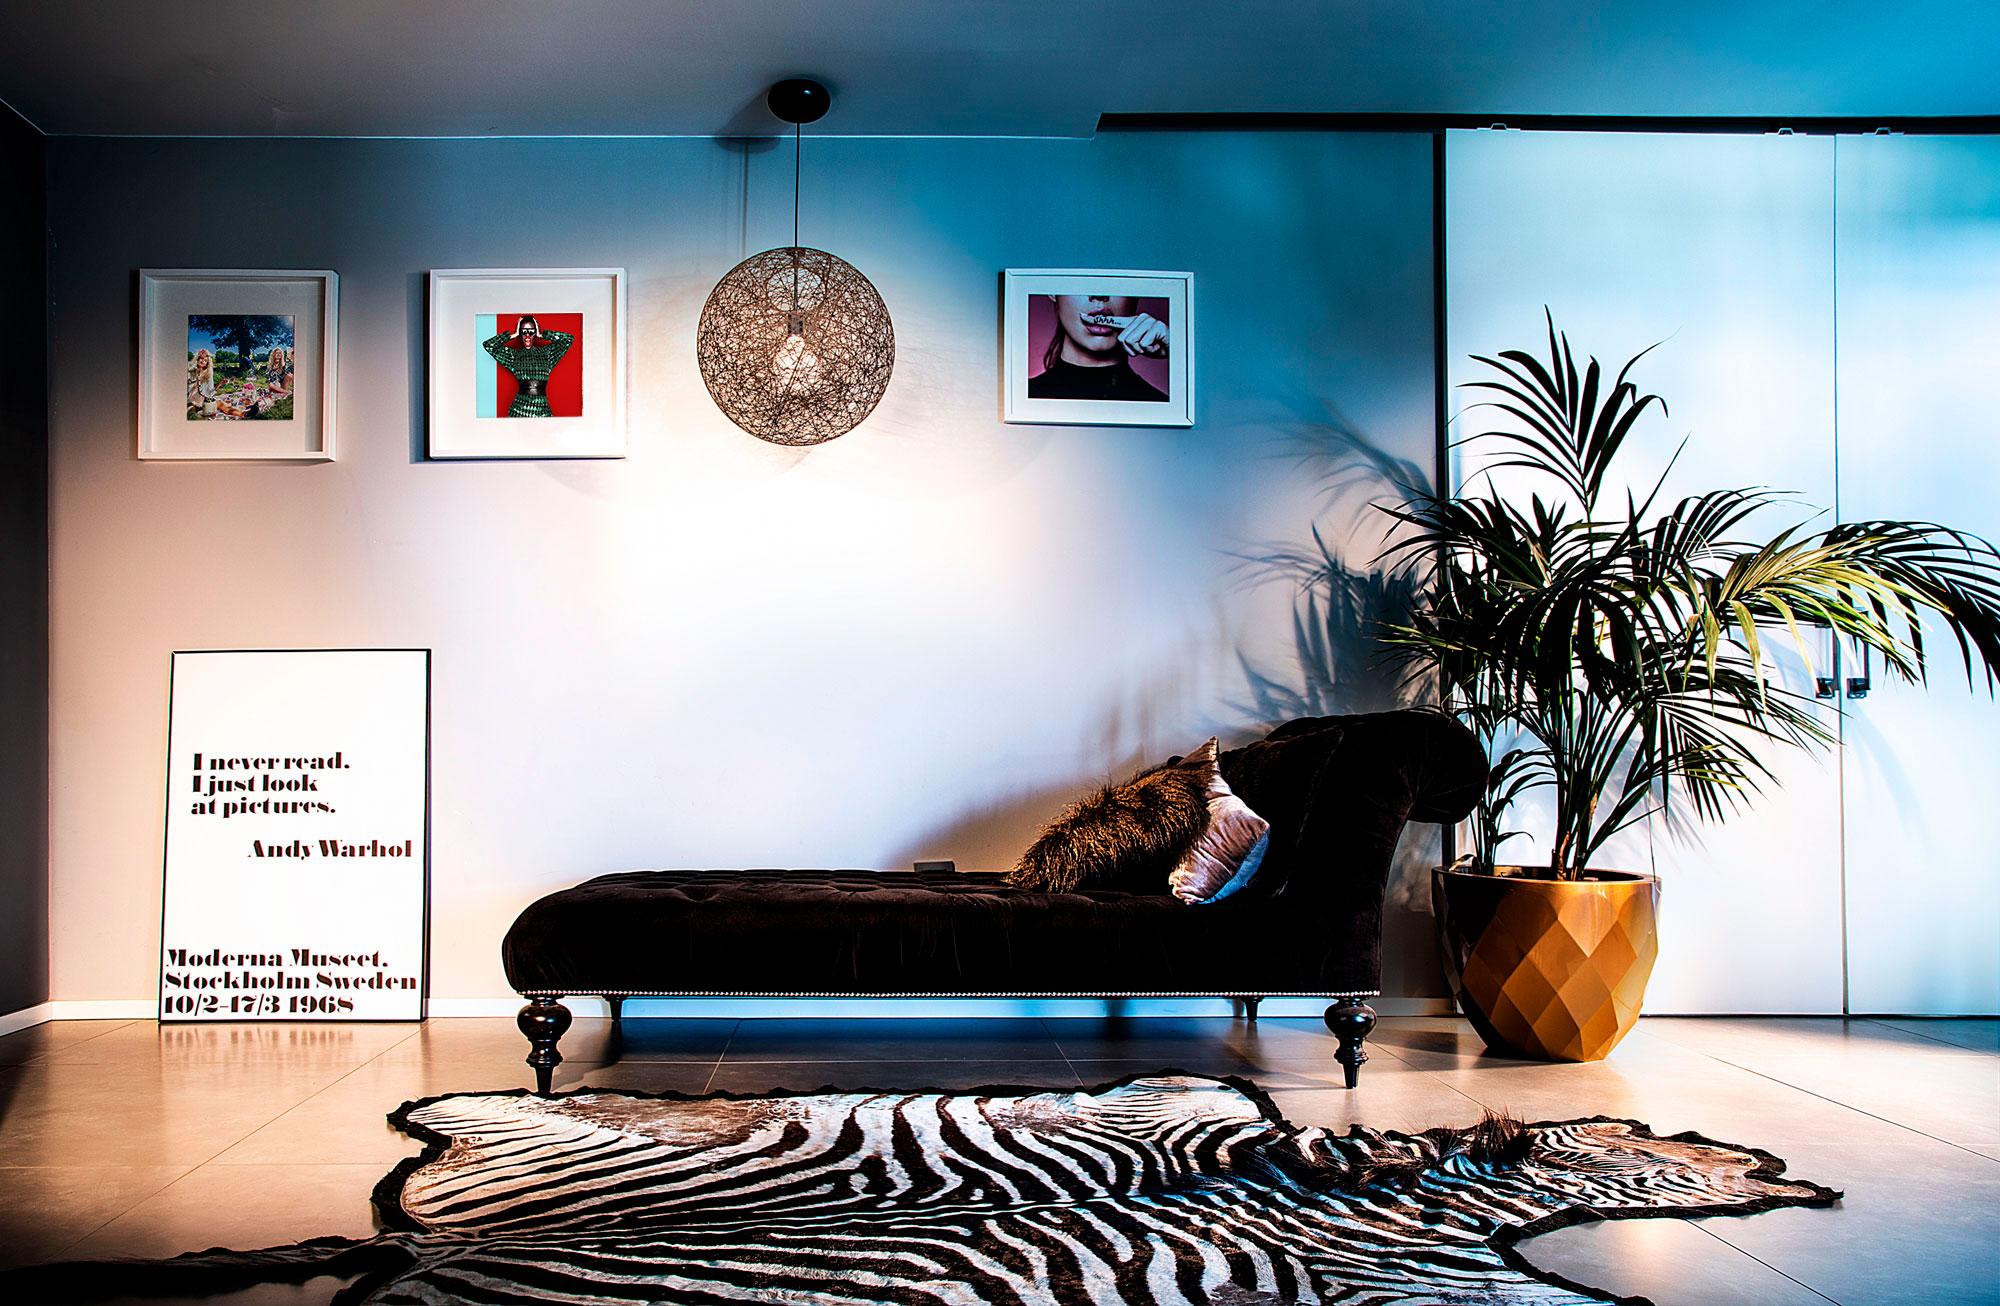 Diseño de Interiores: Soul Arquitectura crea proyectos lujuosos diseño de interiores Diseño de Interiores: Soul Arquitectura crea proyectos lujuosos Featured 19